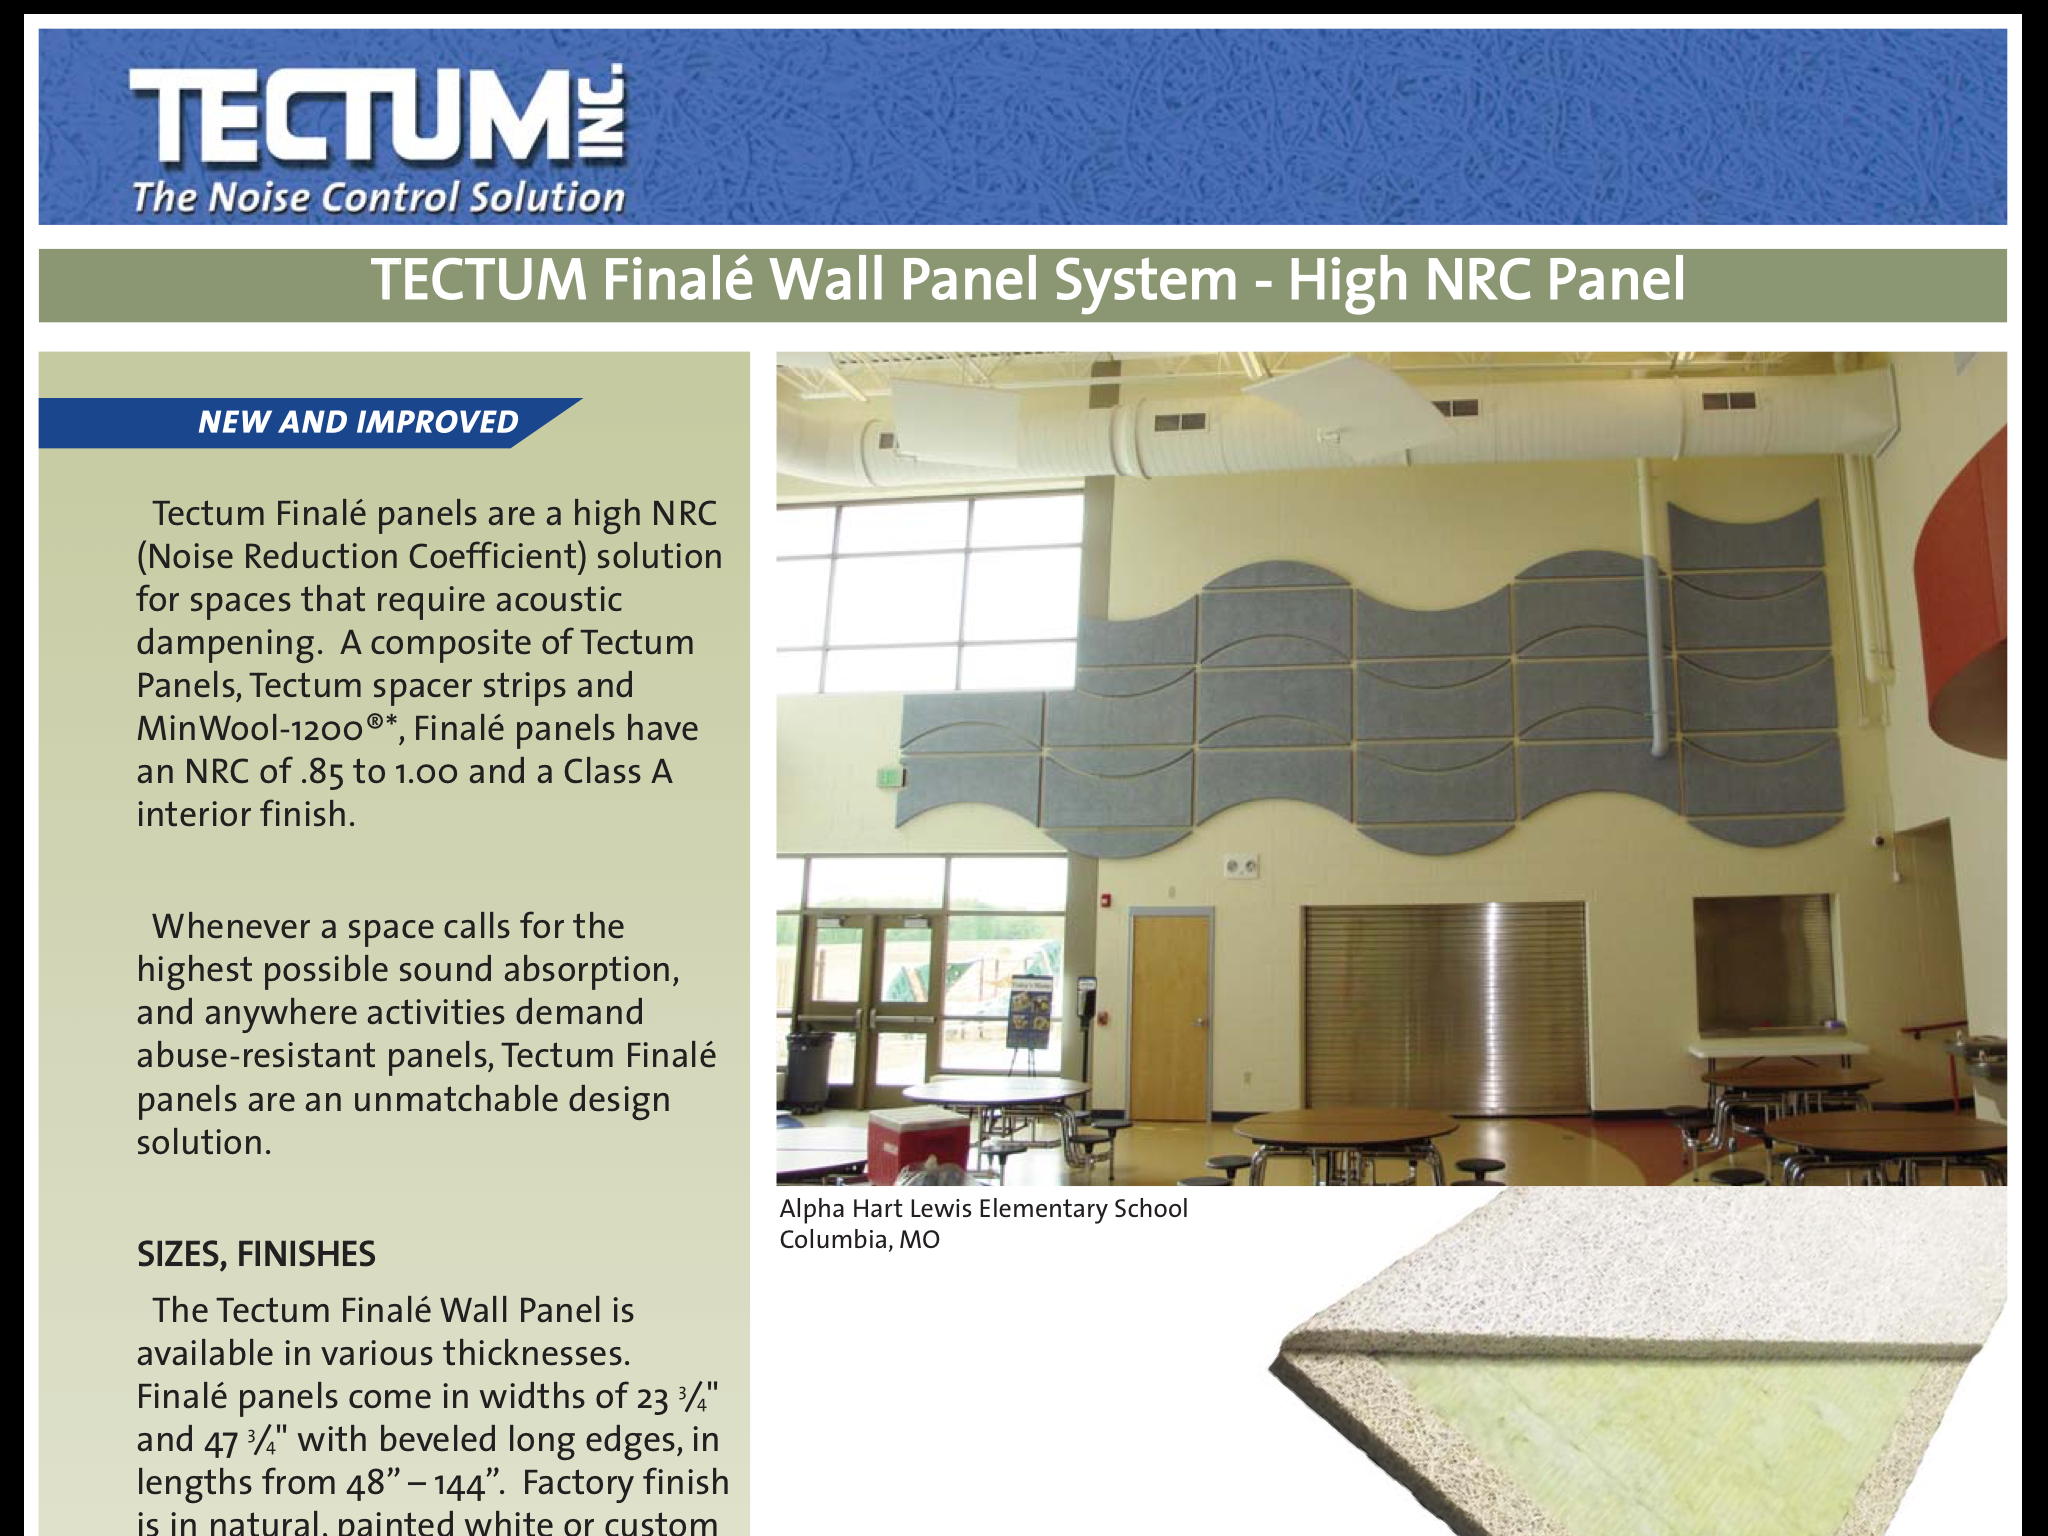 Pin By Angela Borrowman On Wall Panels Wall Panels Wall Panel System Wall Paneling